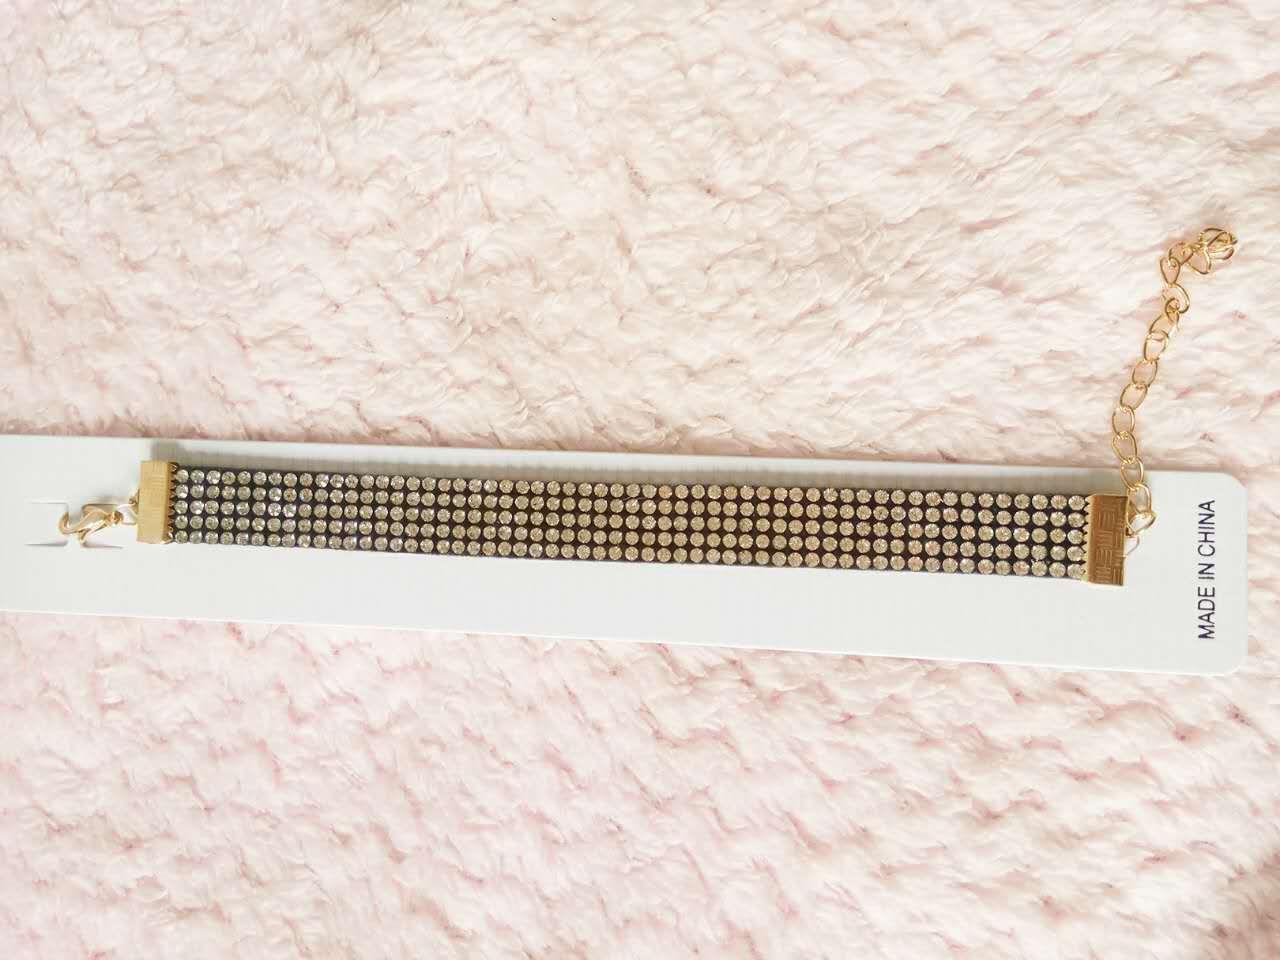 2017 Clear Spring Gold Plated Crystal Rhinestone Bracelets